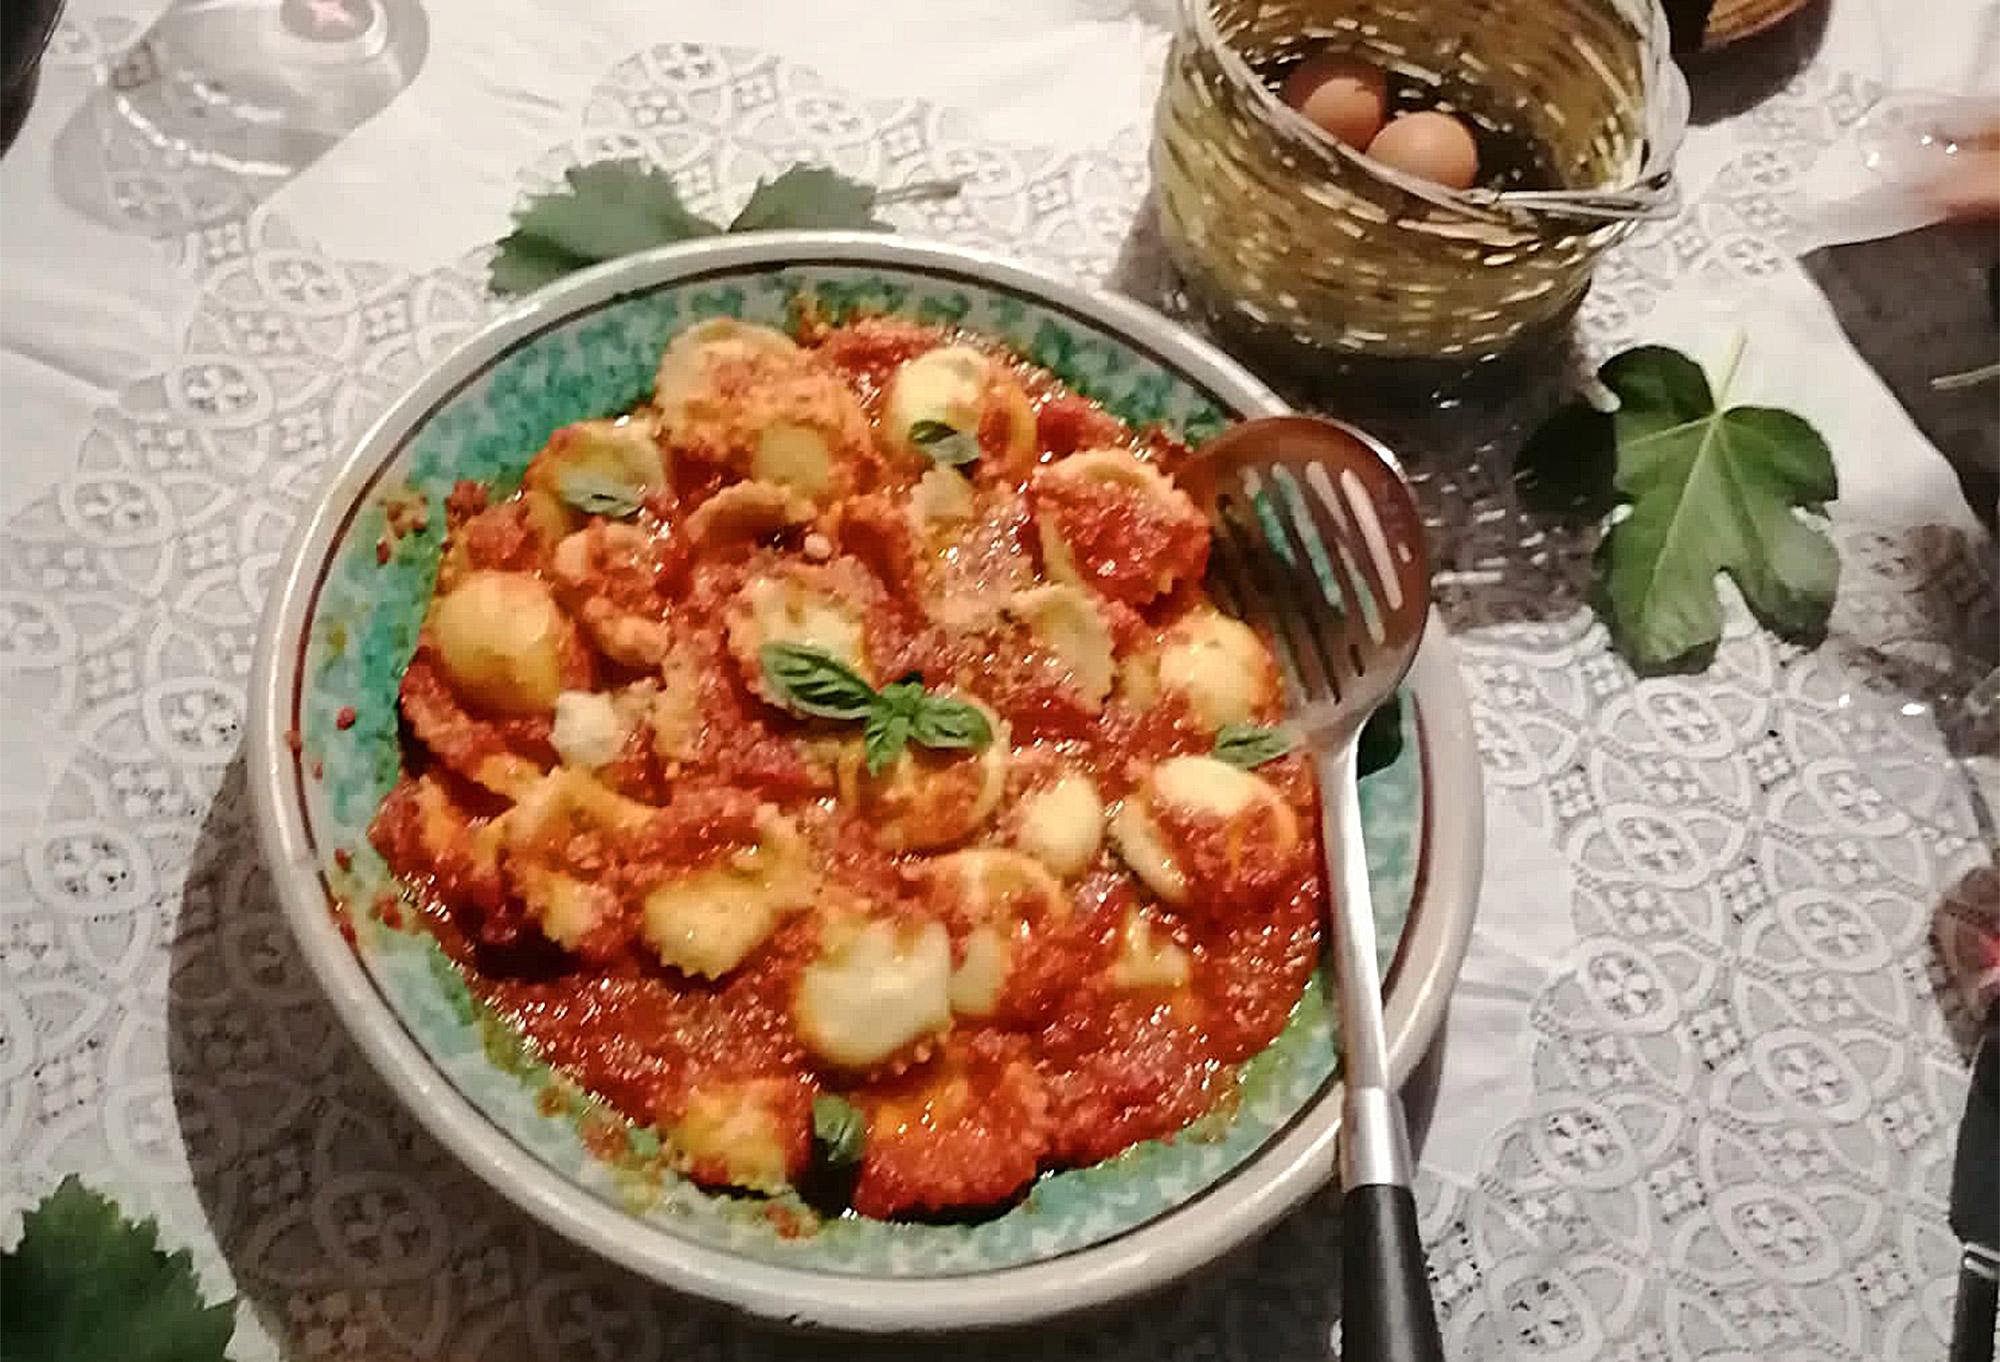 Das fertige Gericht: Ricotta-Ravioli aus Modica